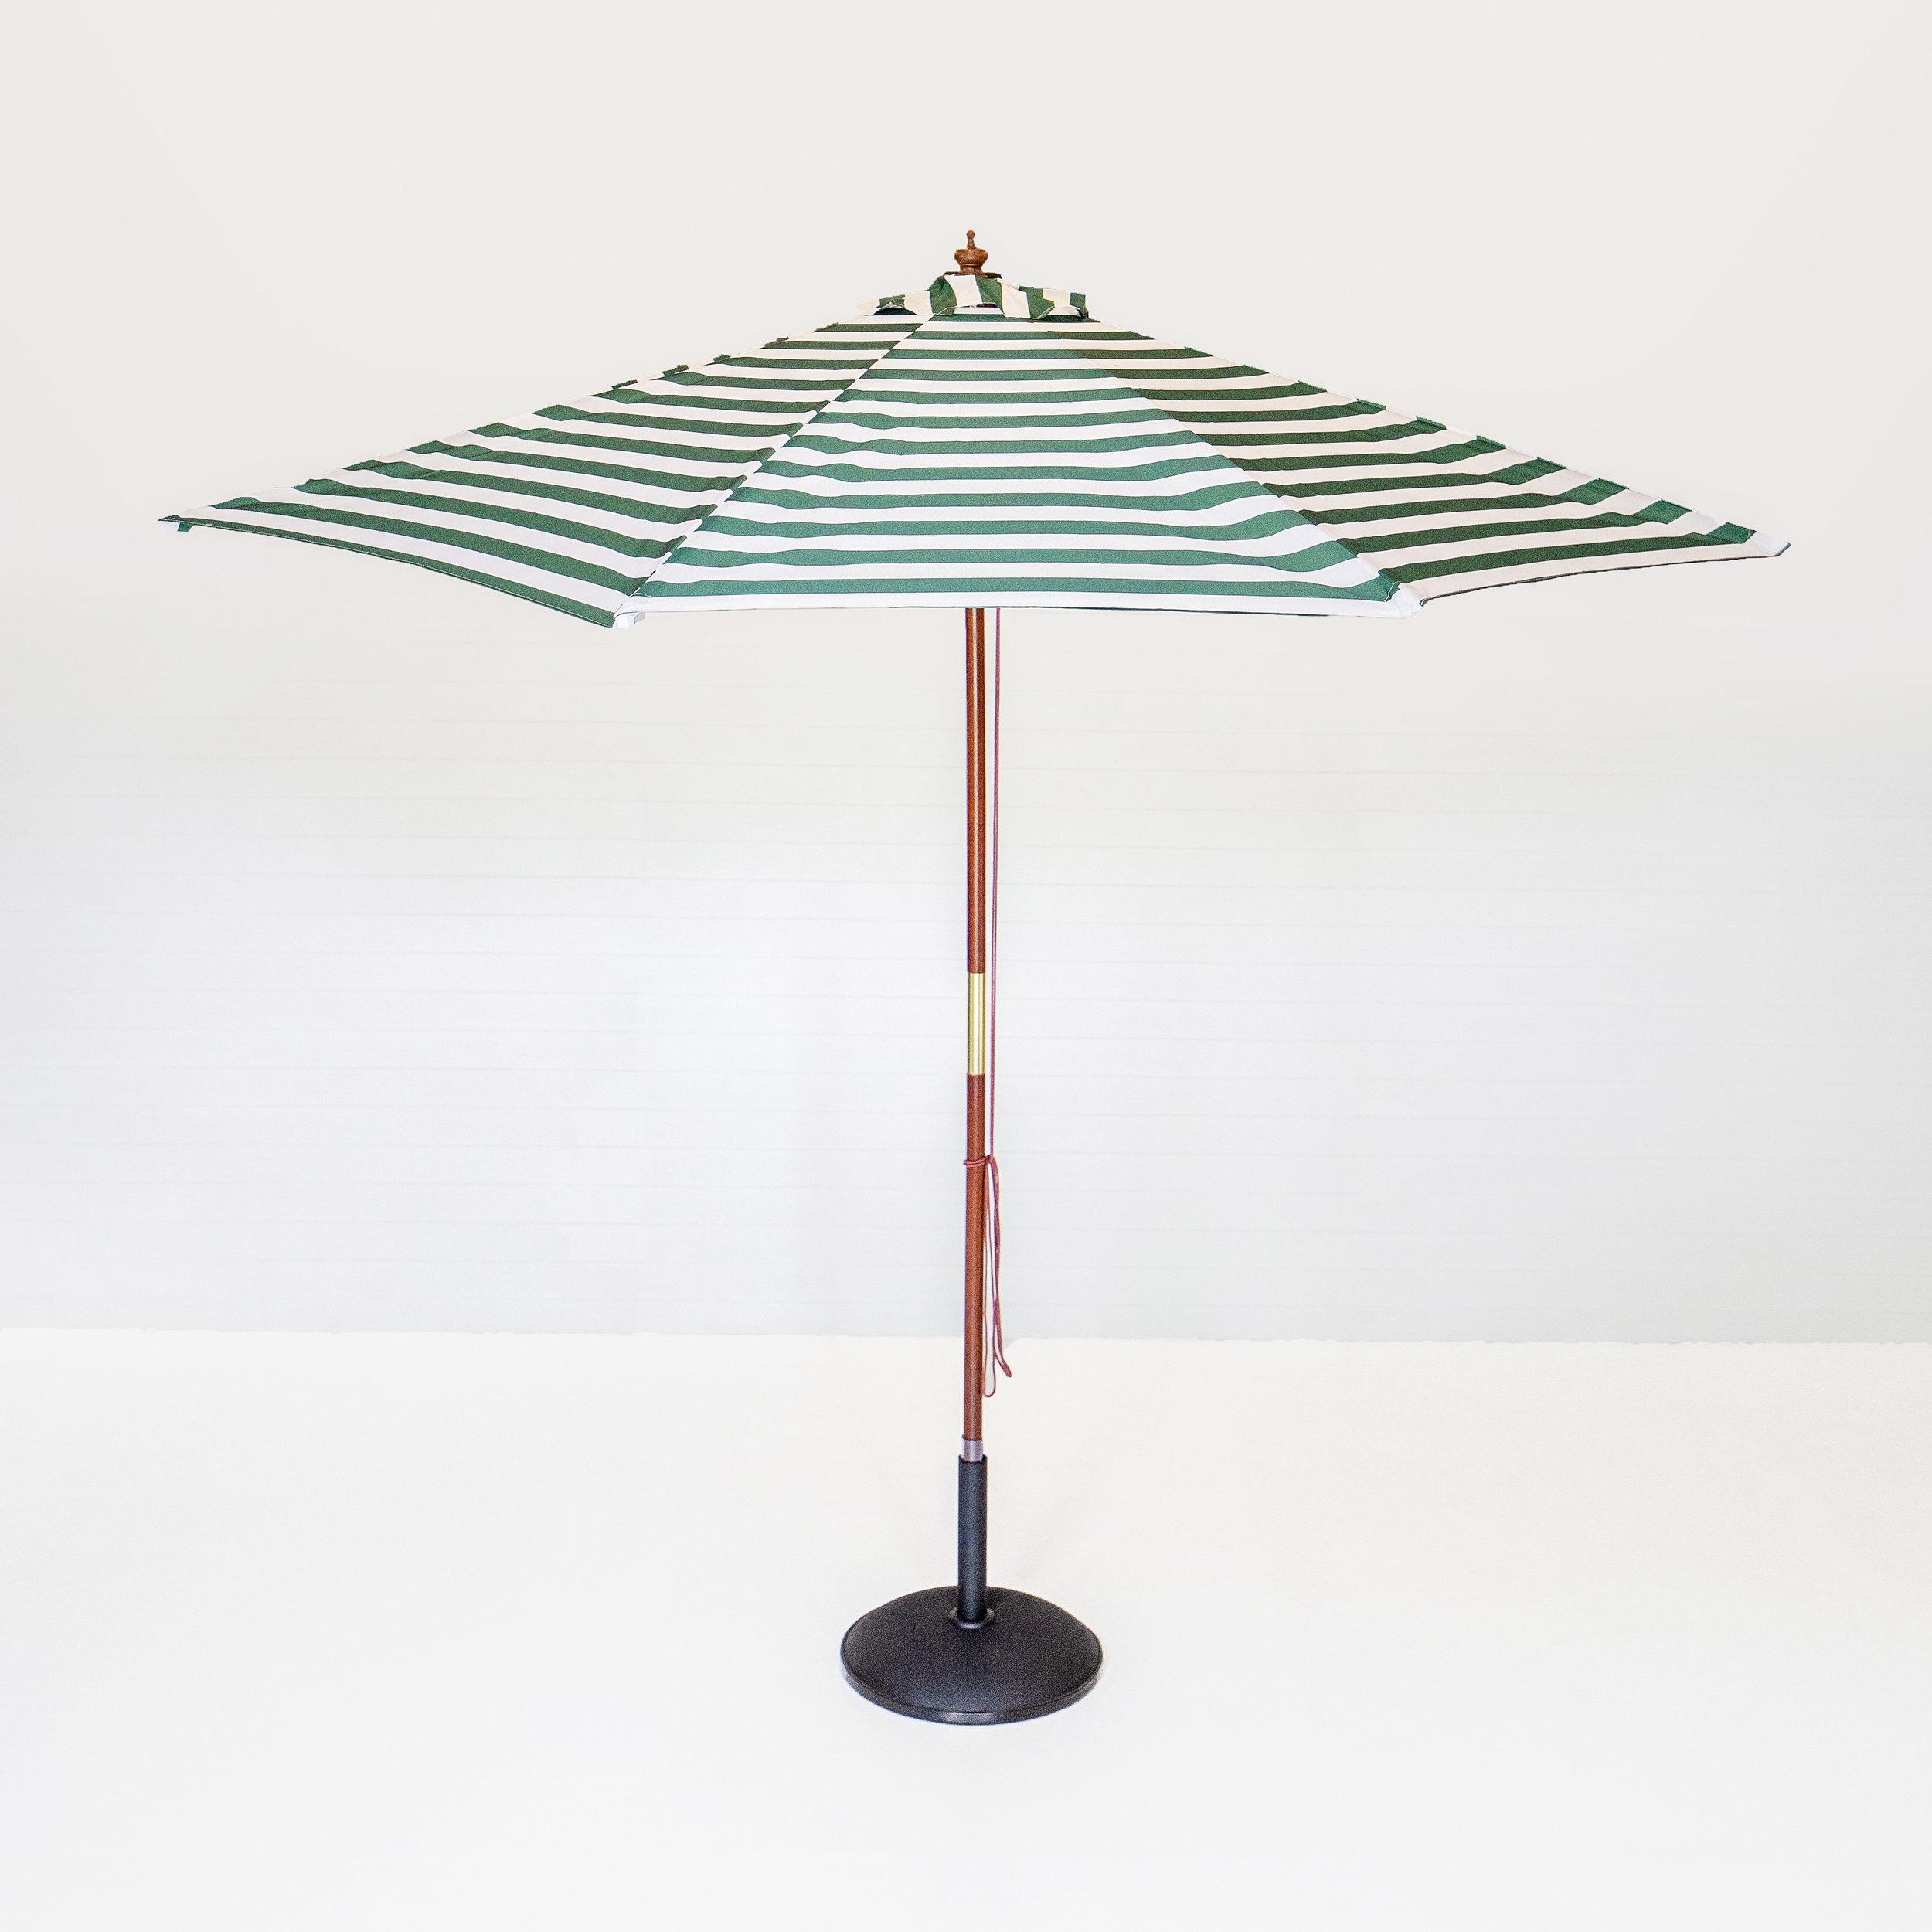 Green and White Stripe Market Umbrella